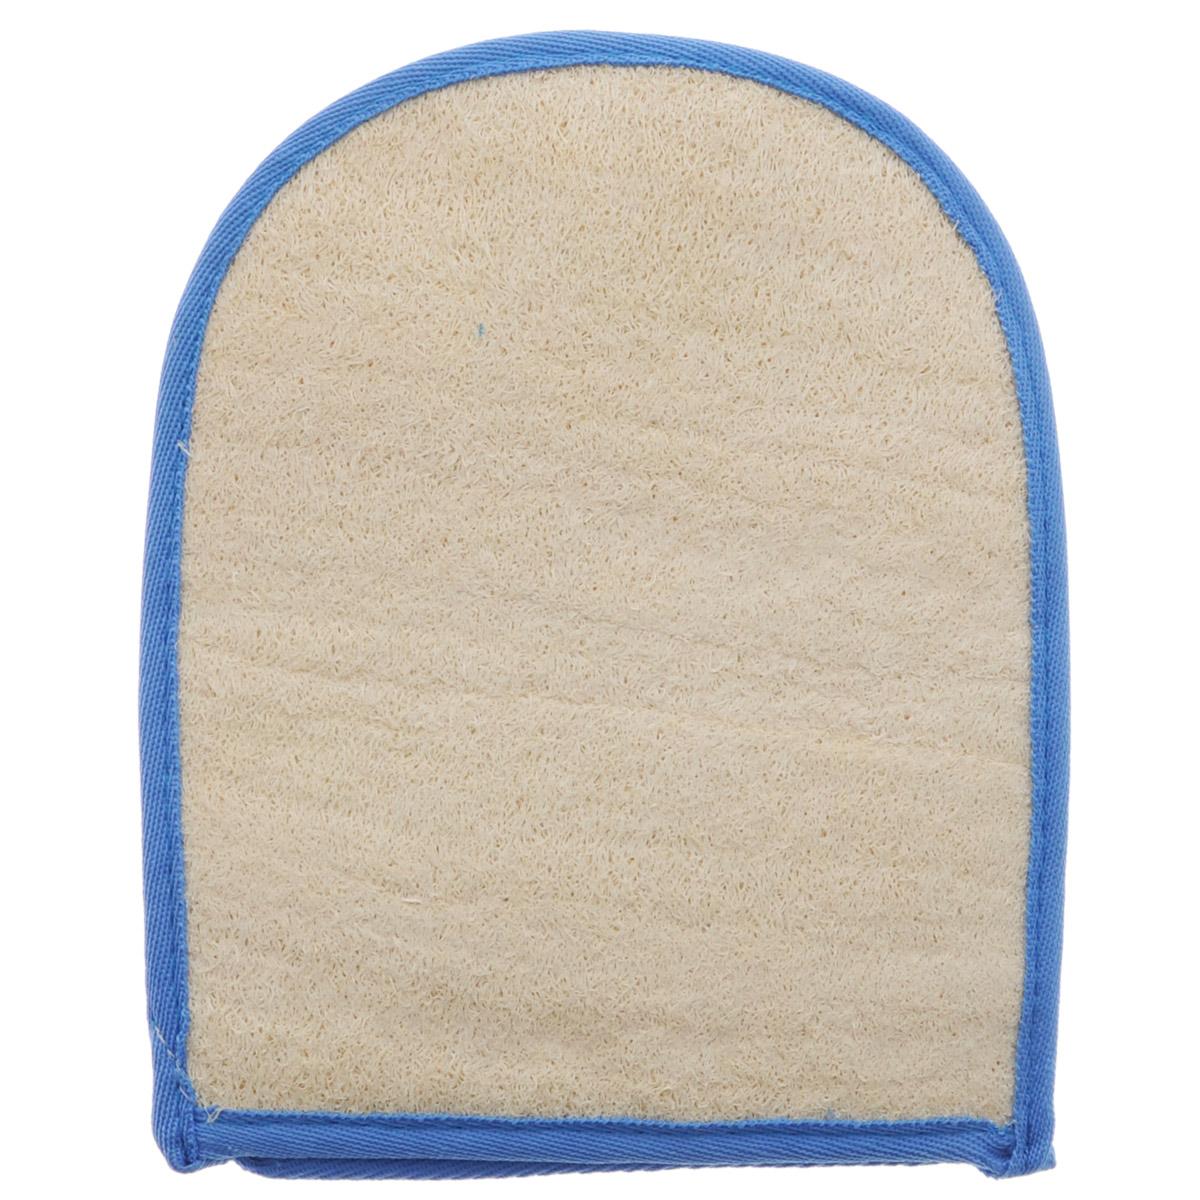 Мочалка-рукавица Home Queen, из люфы, цвет: синий, 20 х 16 см